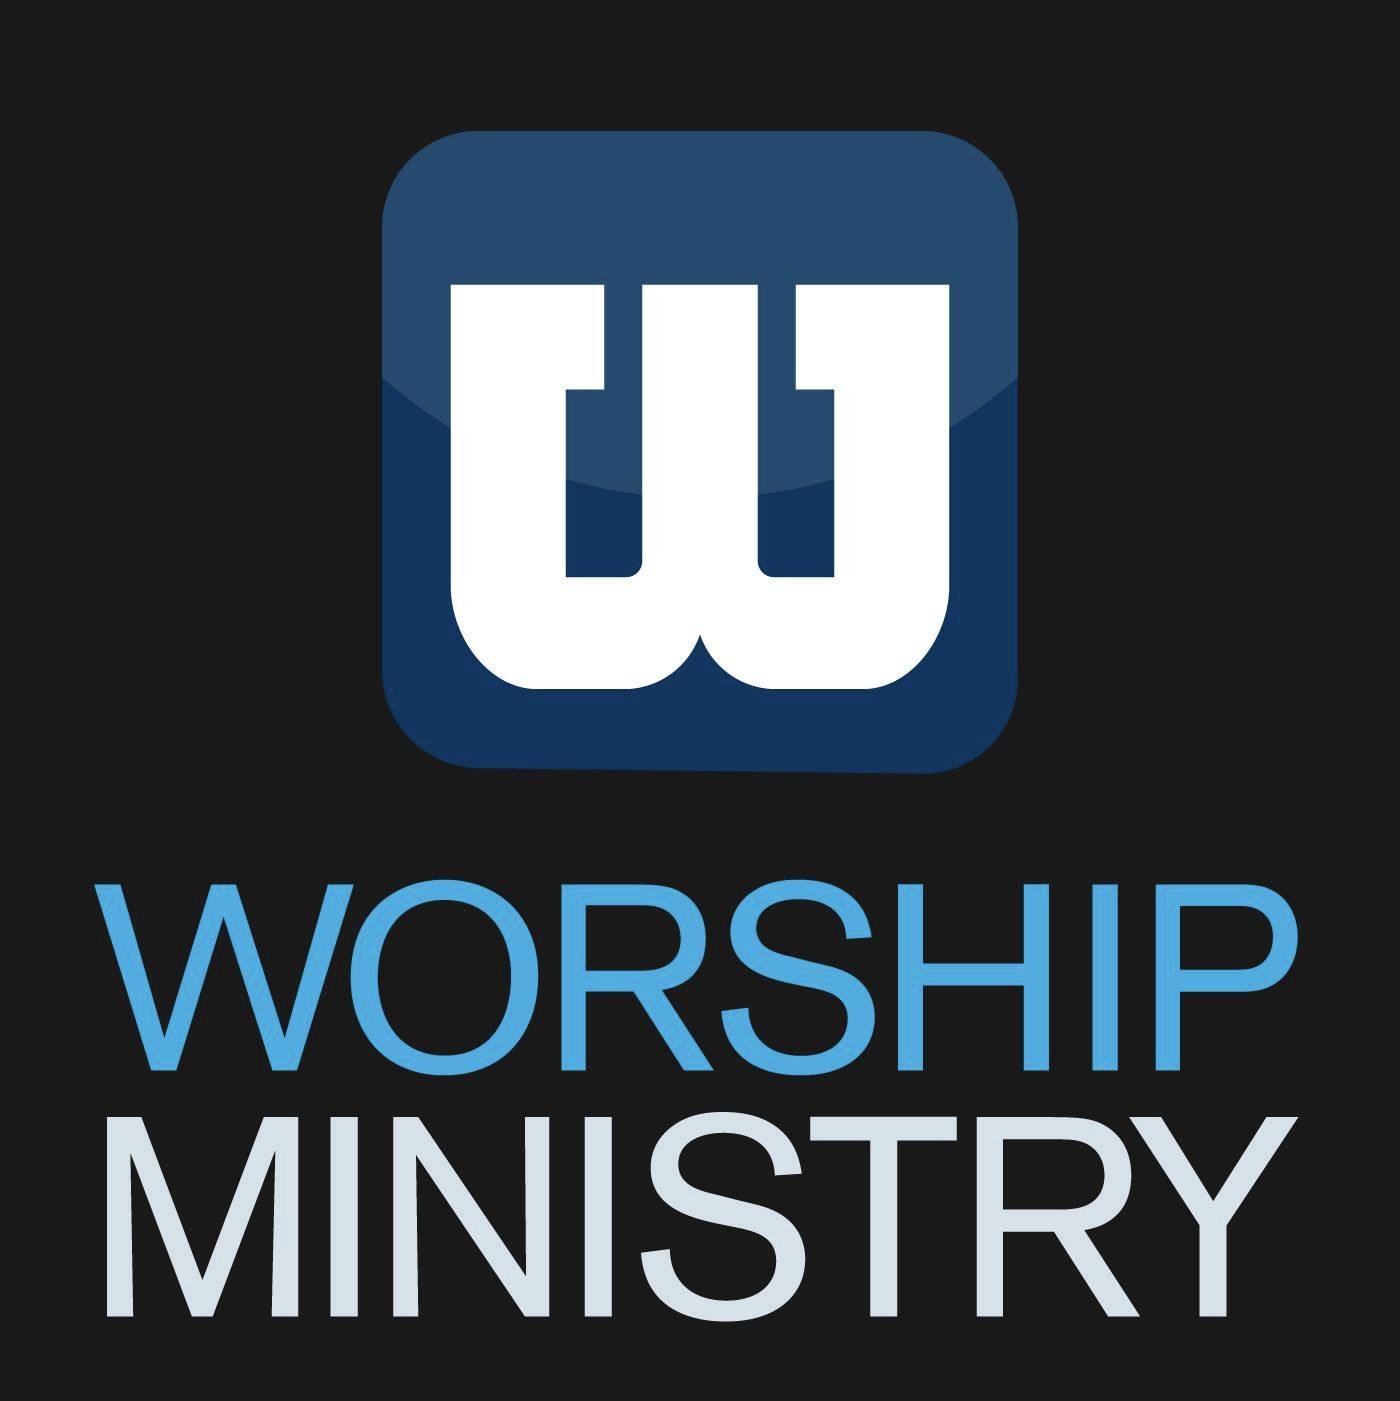 Worship Ministry, Great Church Sound blog